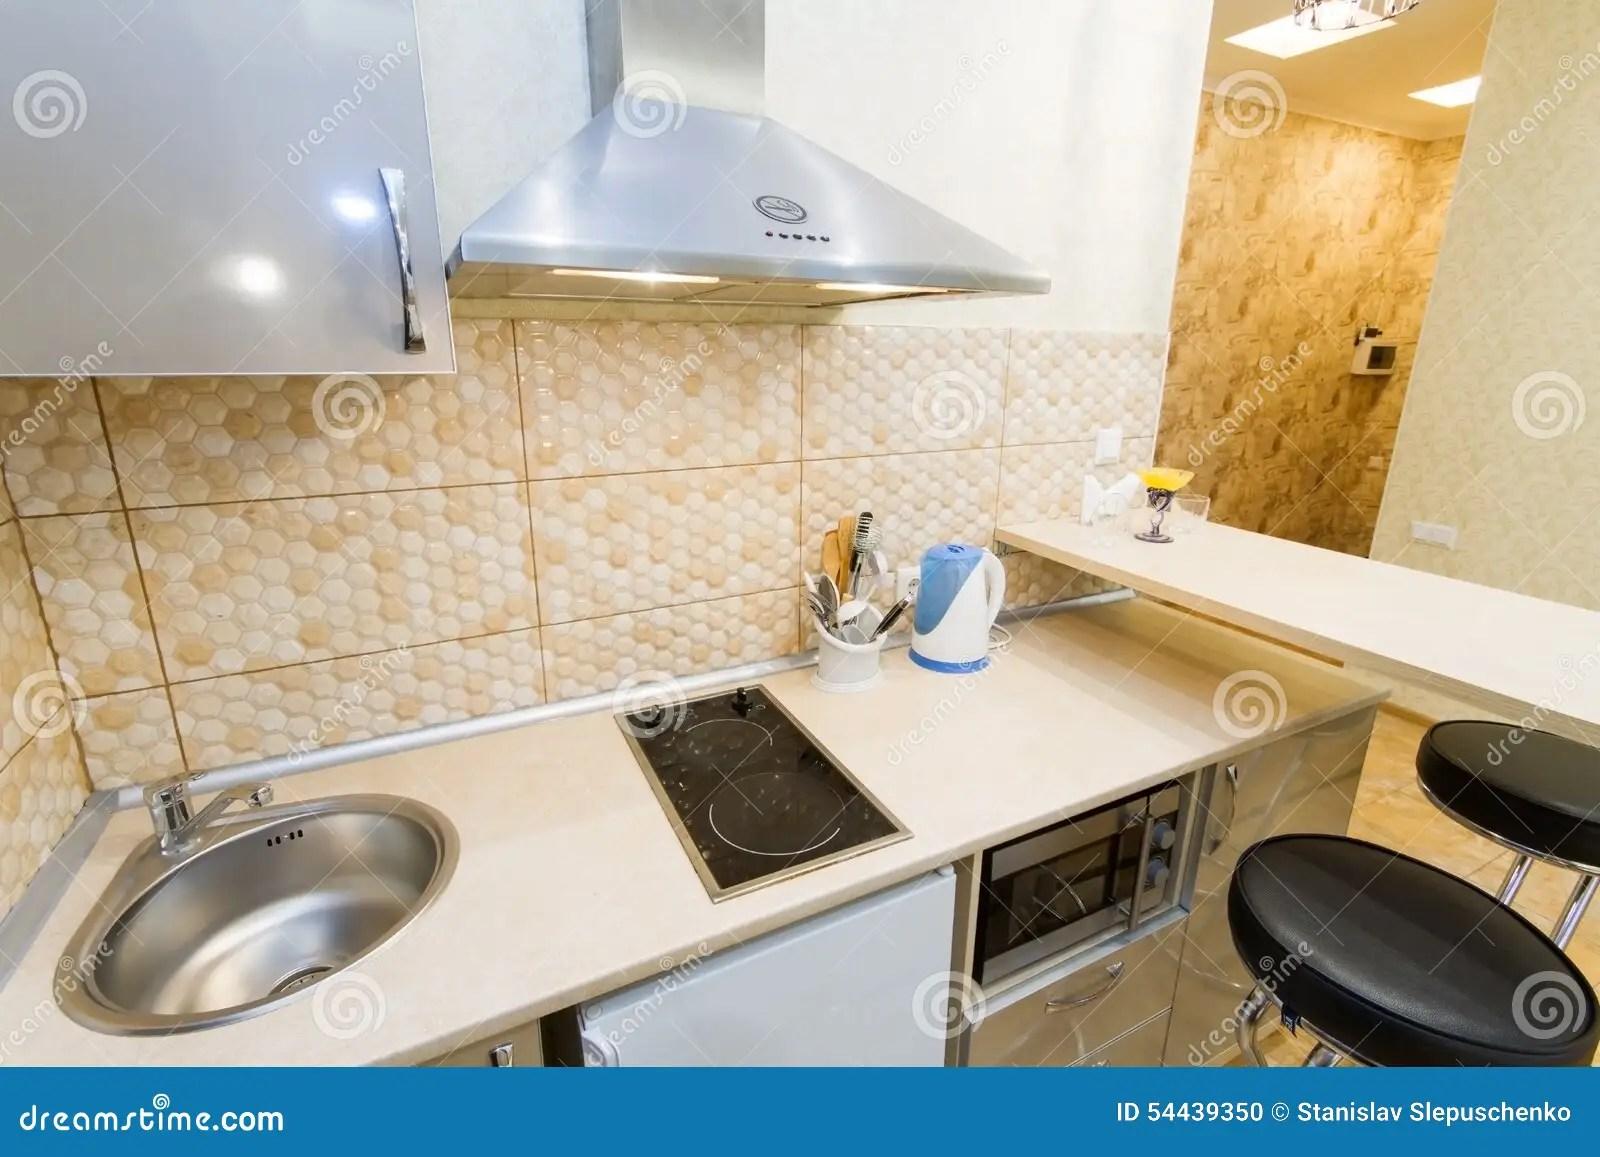 framed prints for kitchens bronze pendant lighting kitchen 厨房内部特写镜头库存照片 图片包括有休眠 全景 宽敞 居住 照亮 厨房内部特写镜头